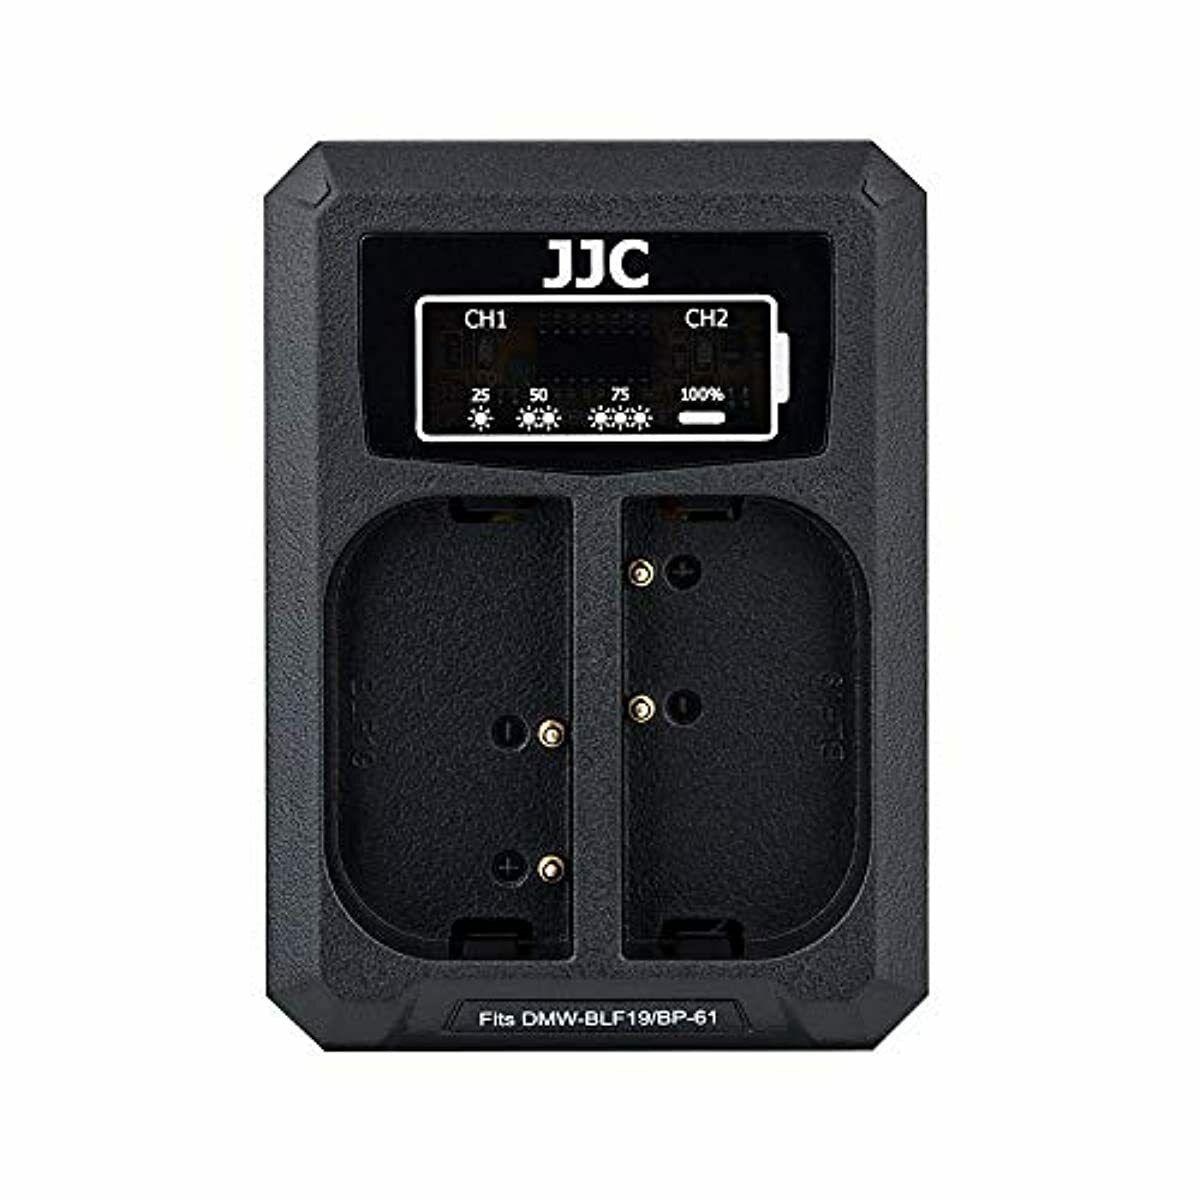 JJC USB Dual Battery Charger for Panasonic GH5s GH5 GH4 GH3, Sigma sd Quattro, s